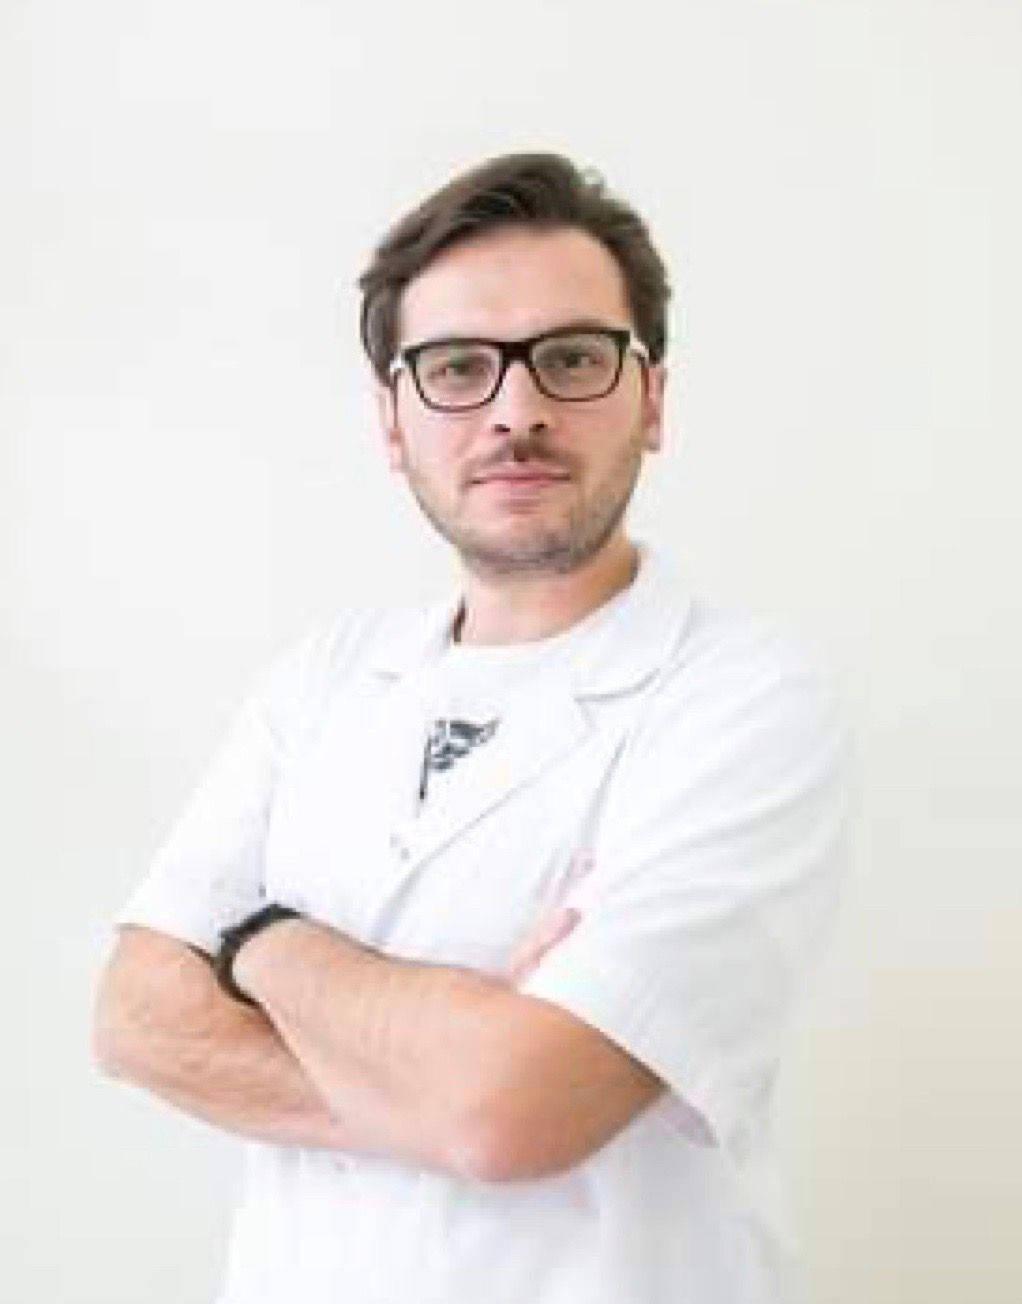 Dermatolog Trójmiasto Dr Andrji Petranyuk gabinet MAM Gdańsk Gdynia Sopot